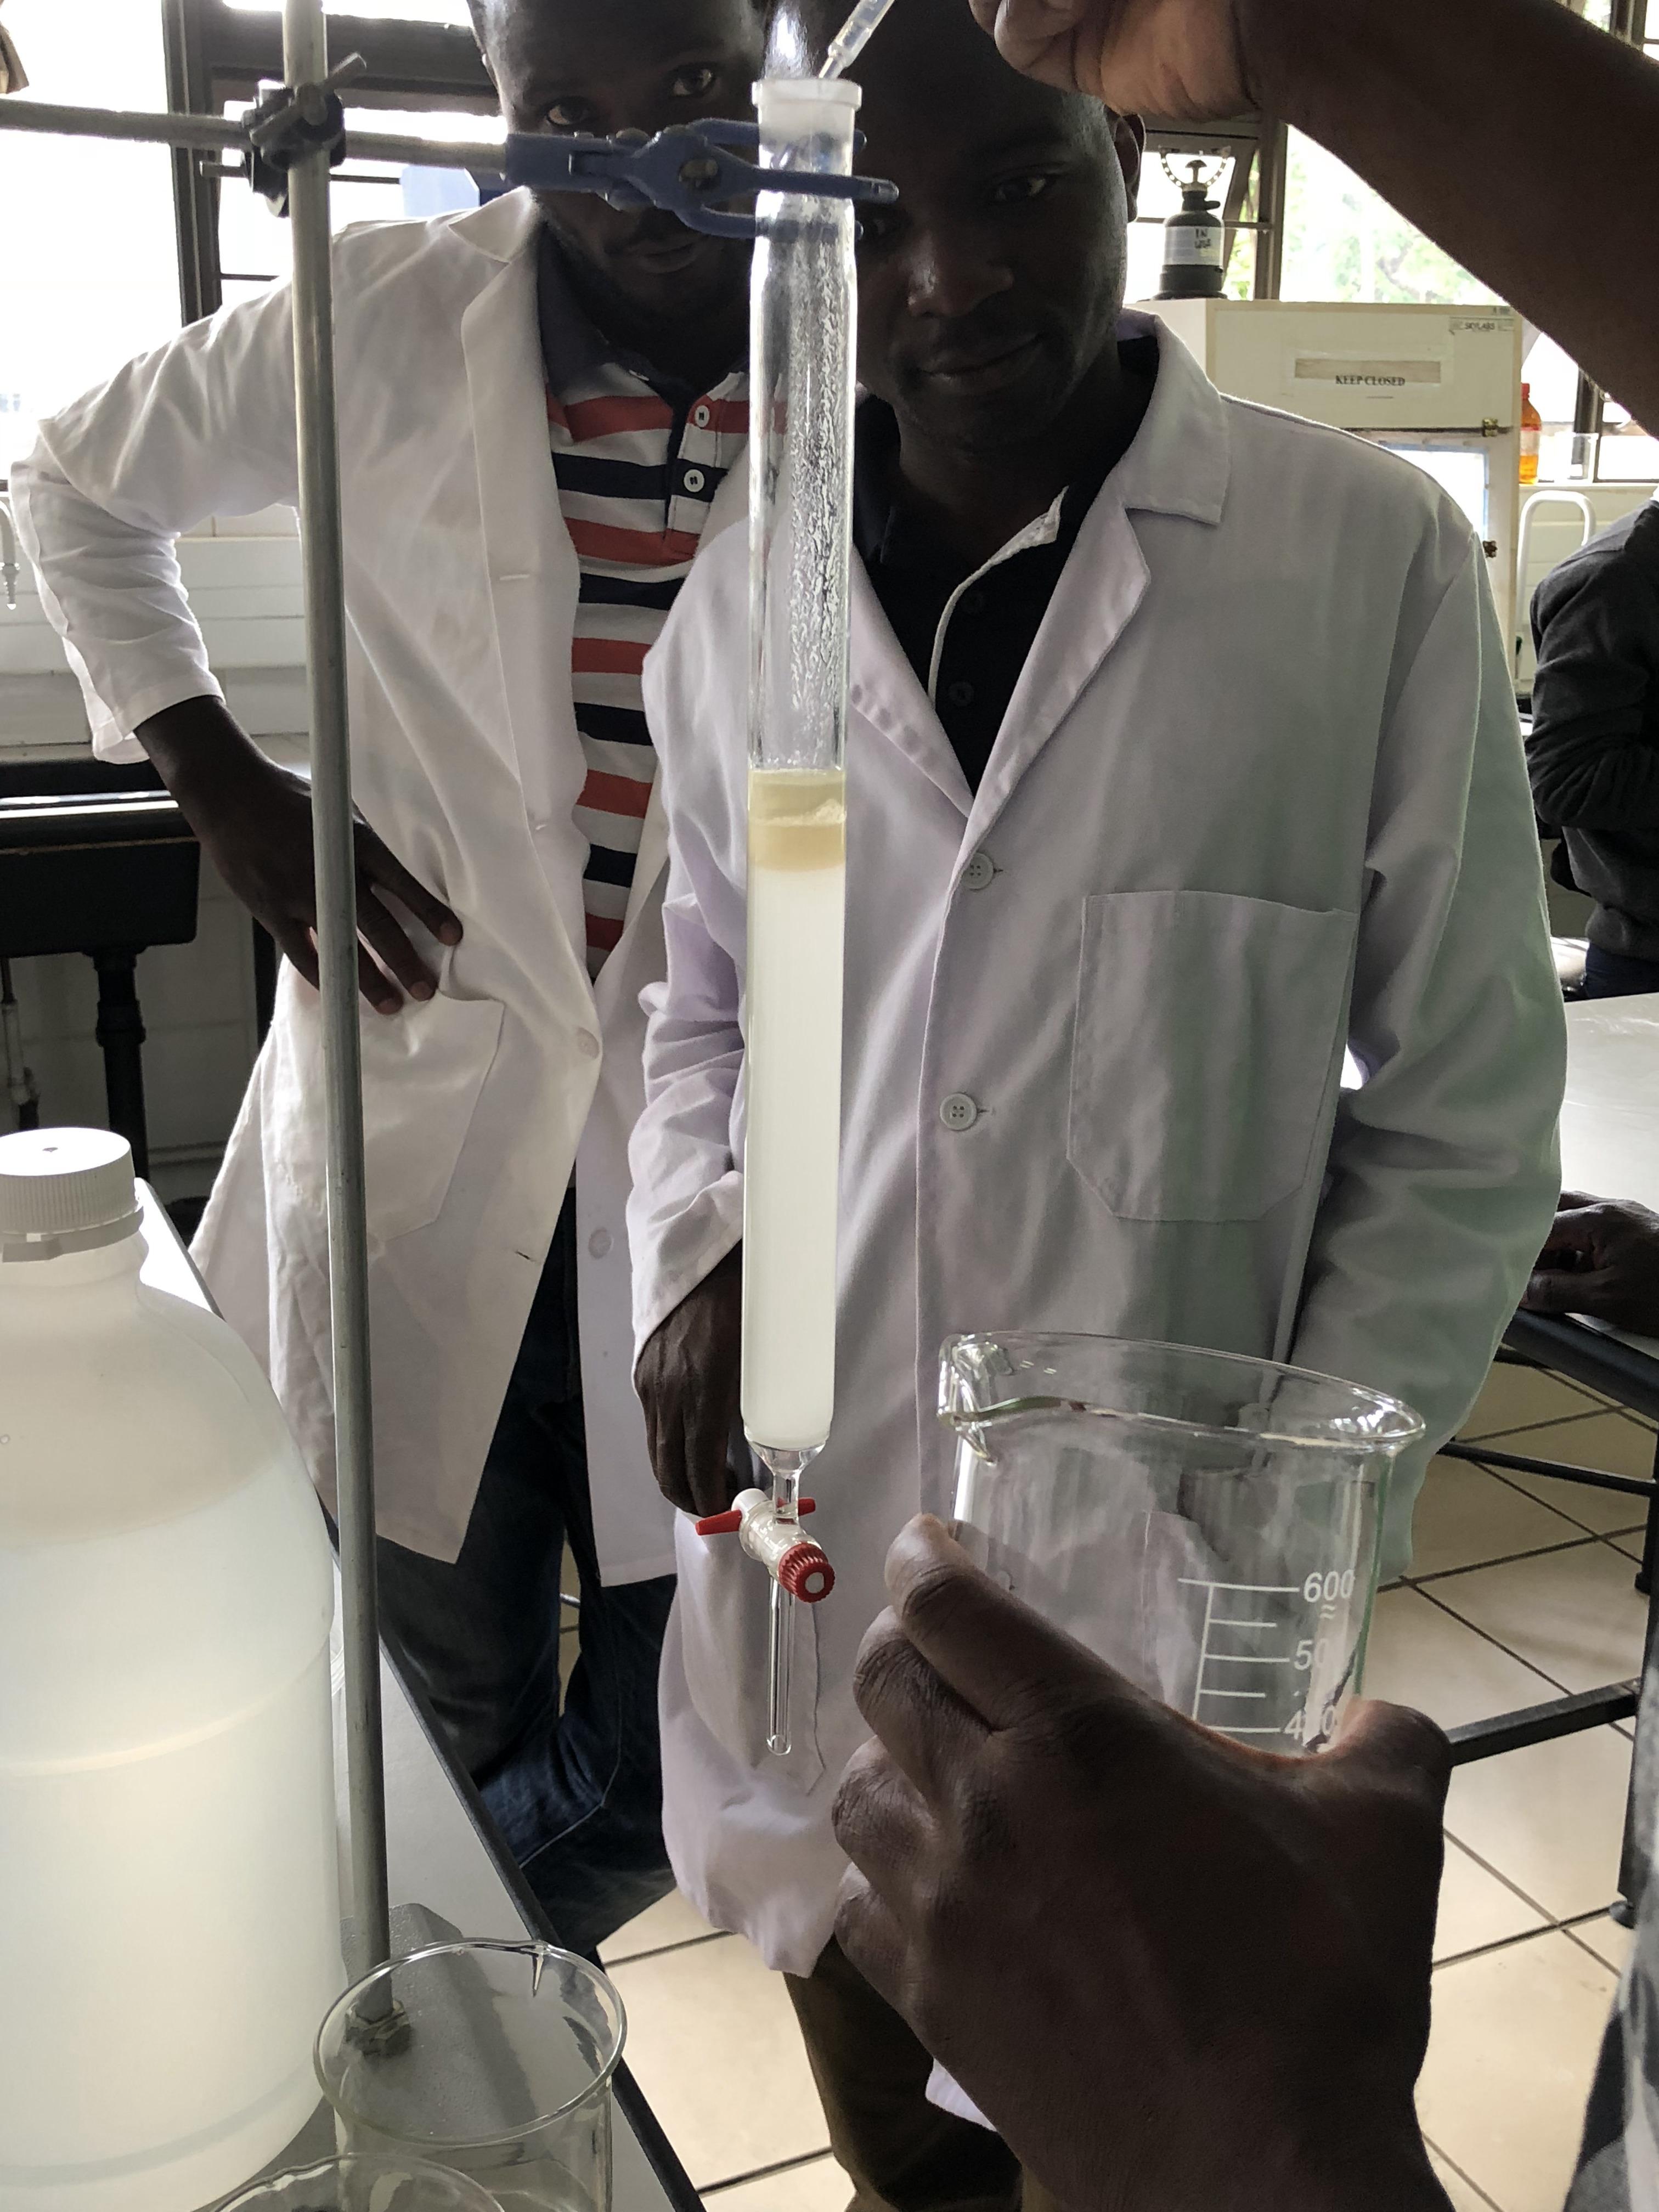 Students running a column. Malawi 2018